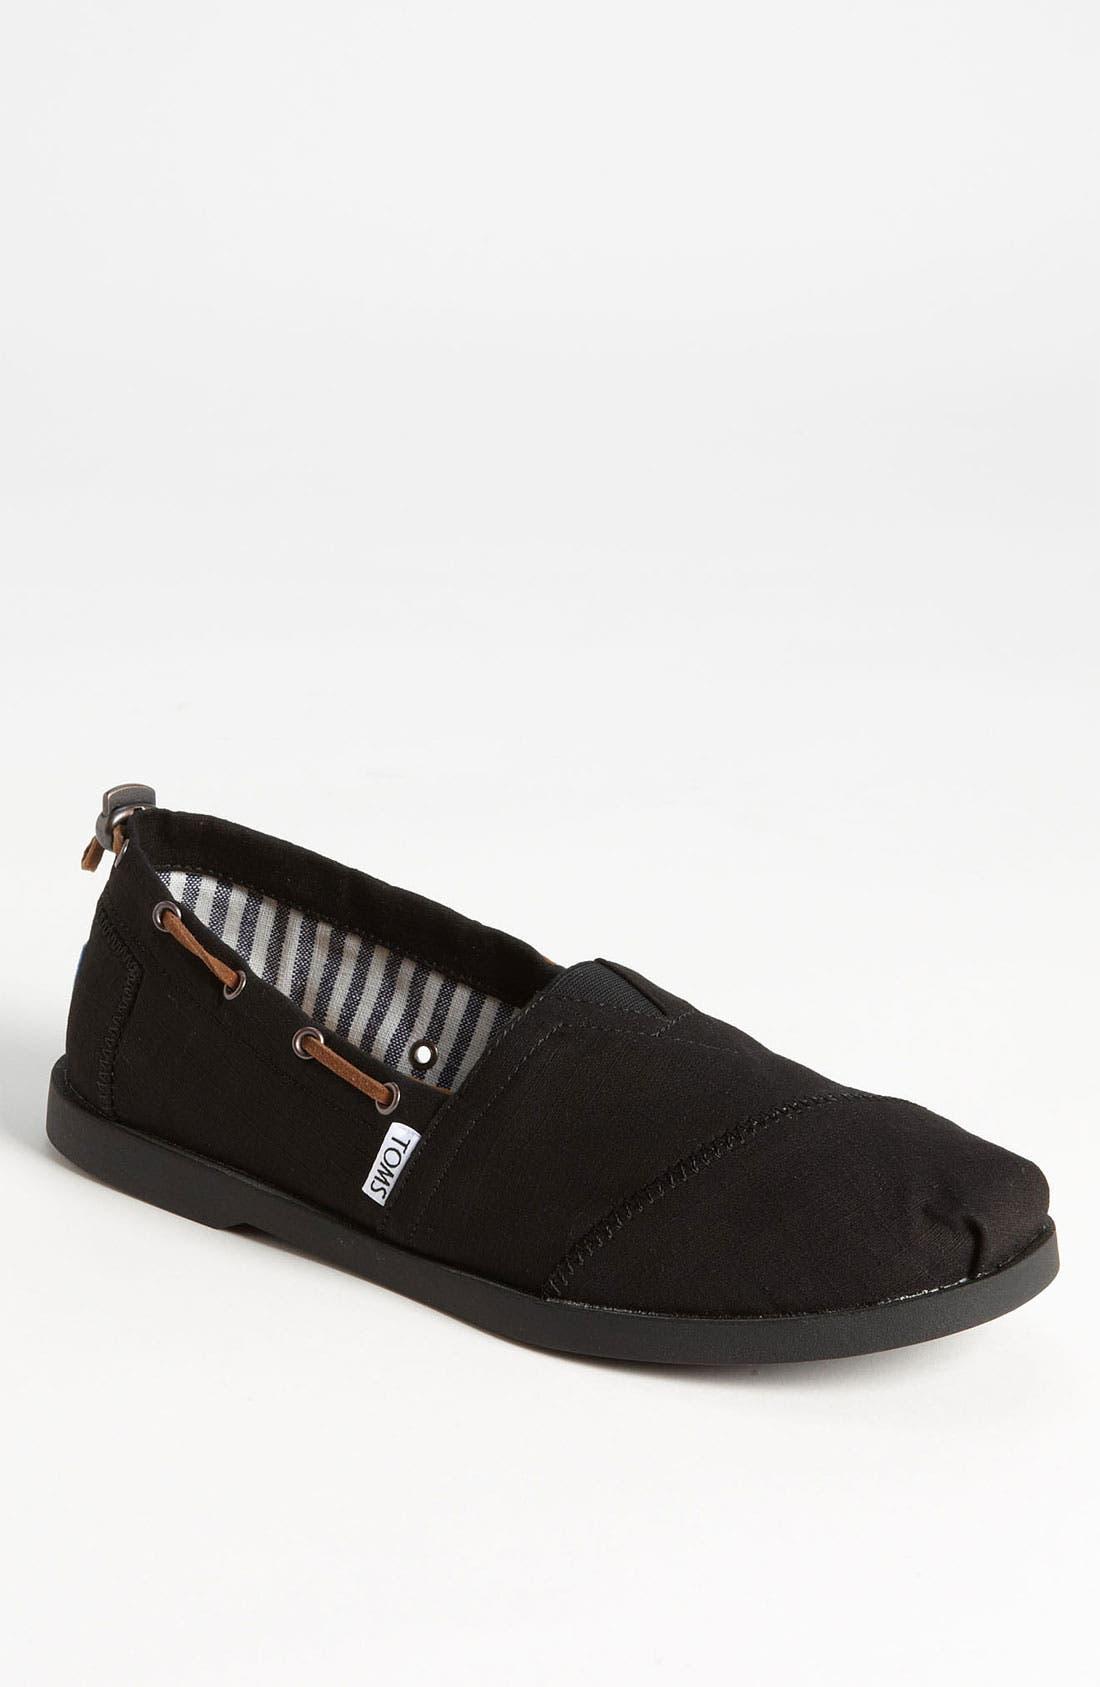 Main Image - TOMS 'Bimini - Nautical' Boat Shoe (Men)